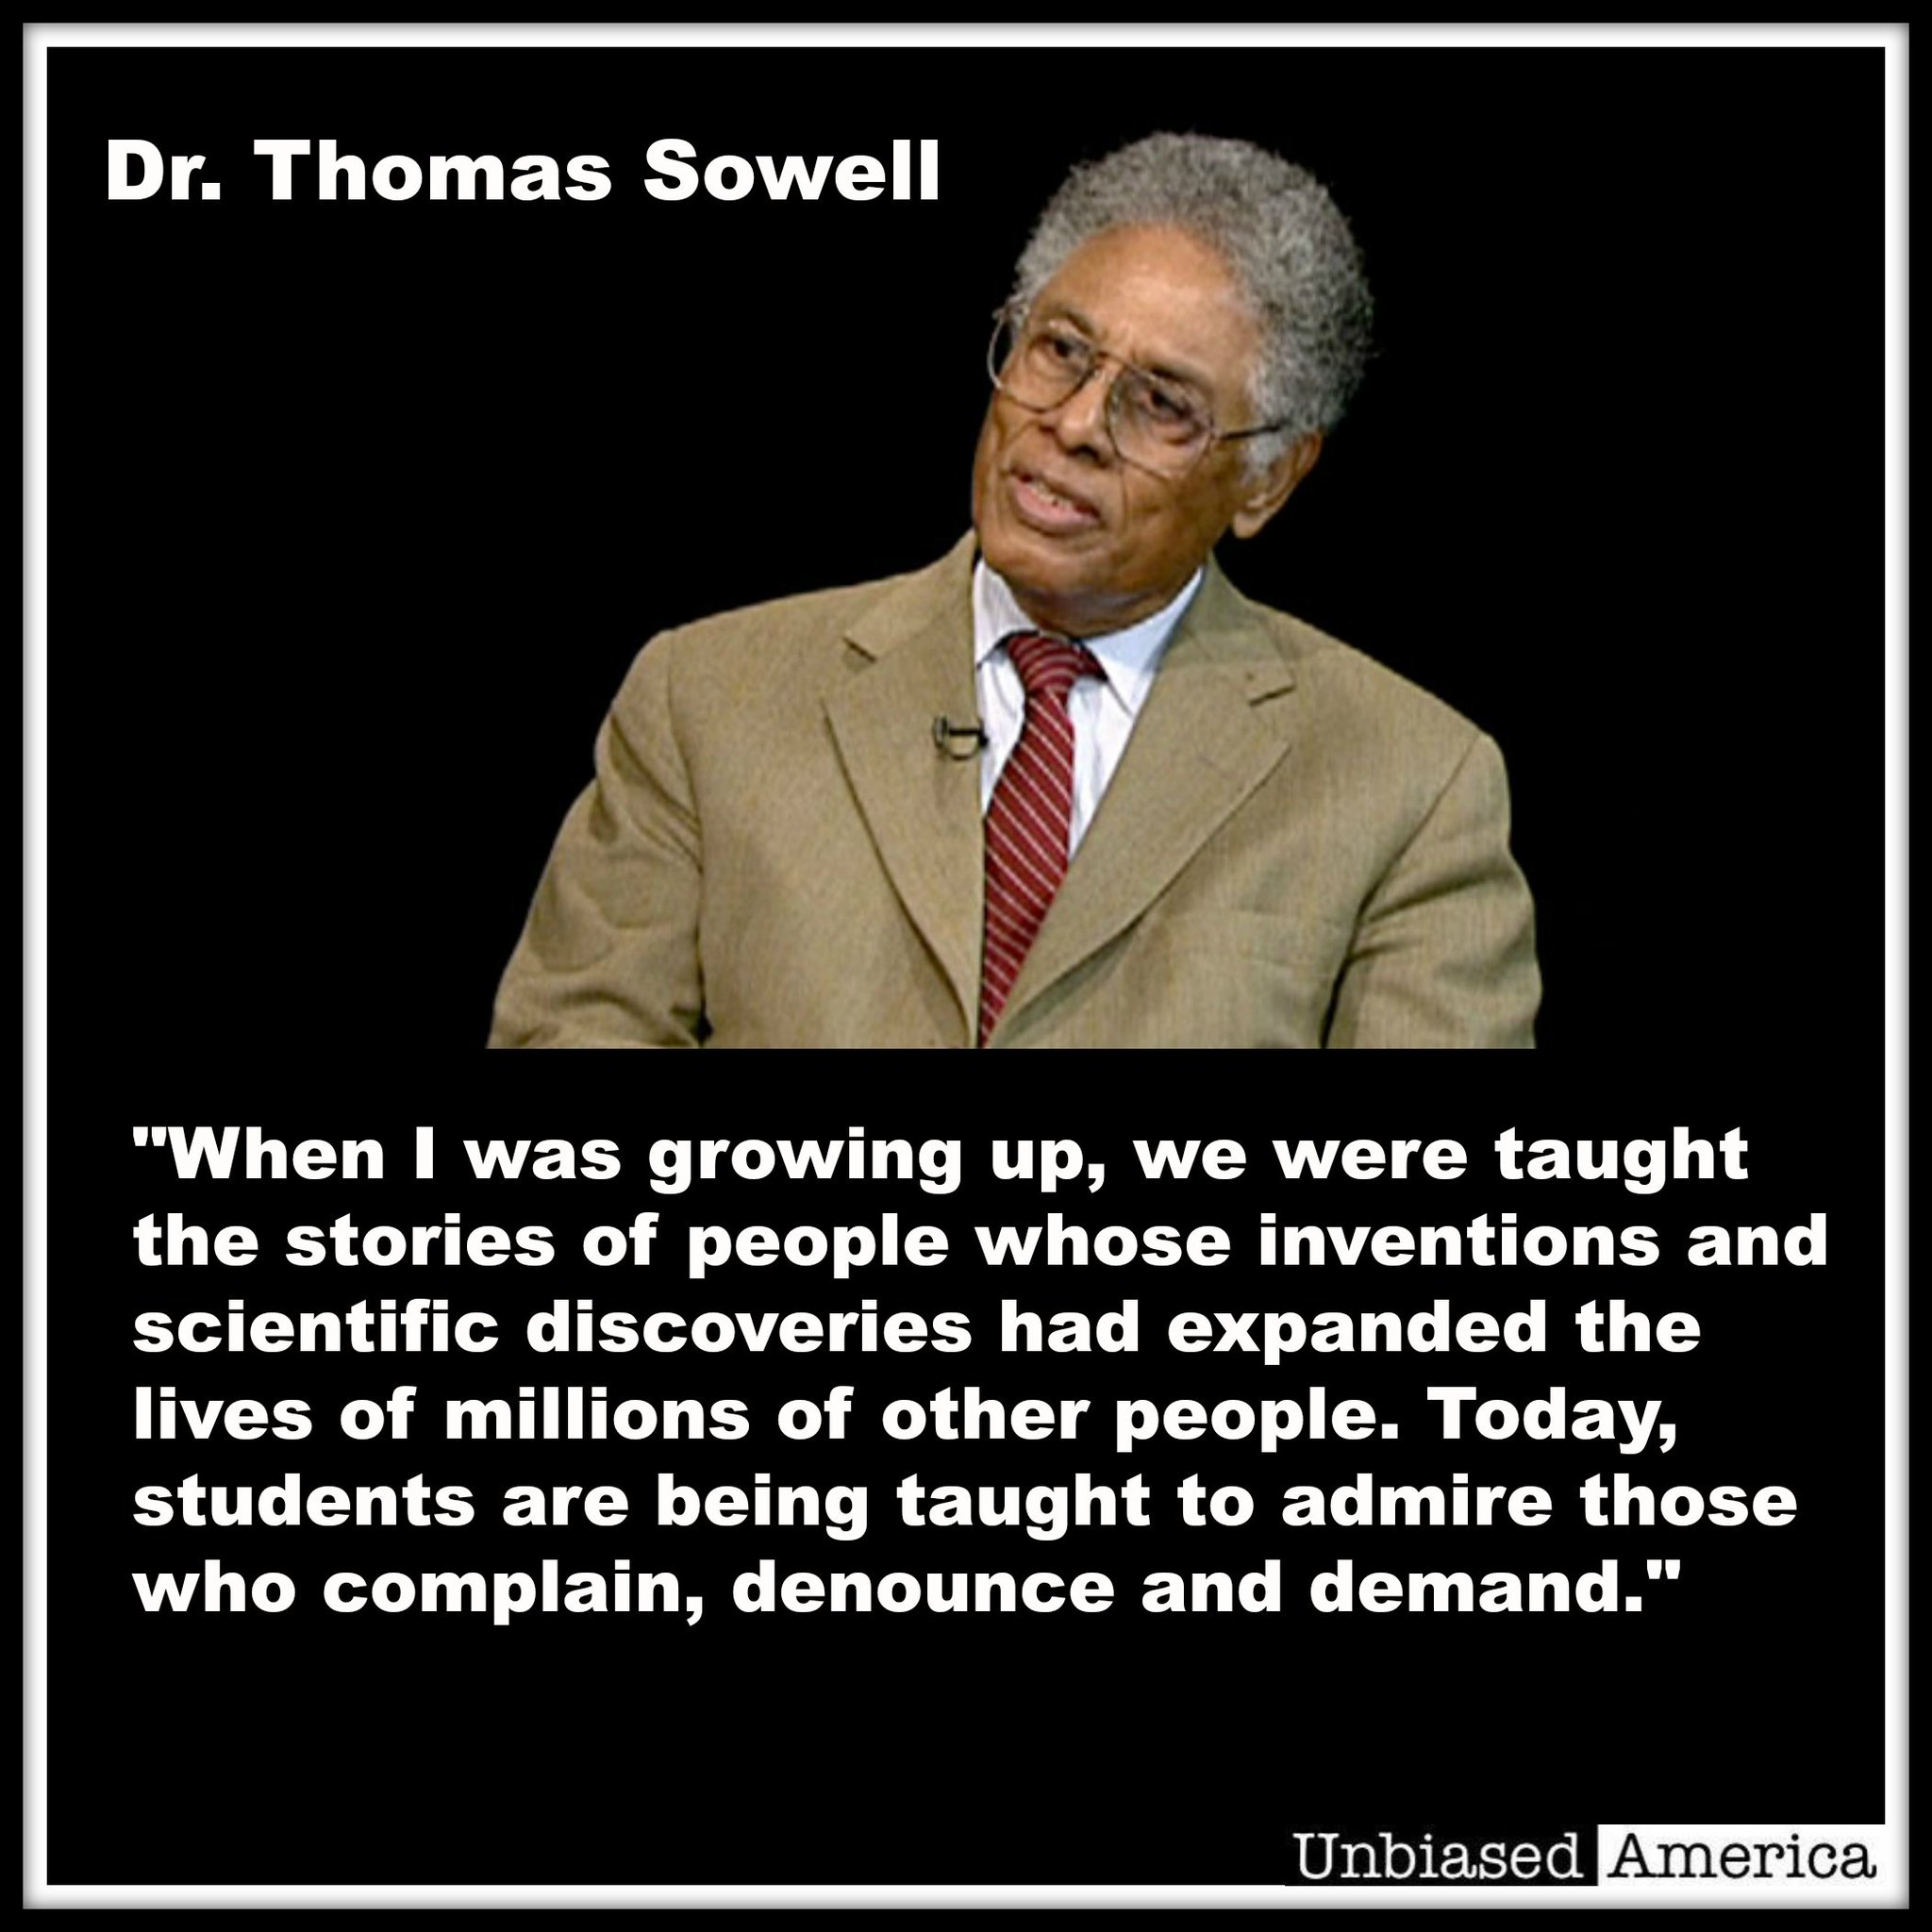 Happy birthday Dr. Thomas Sowell! The greatest living economist